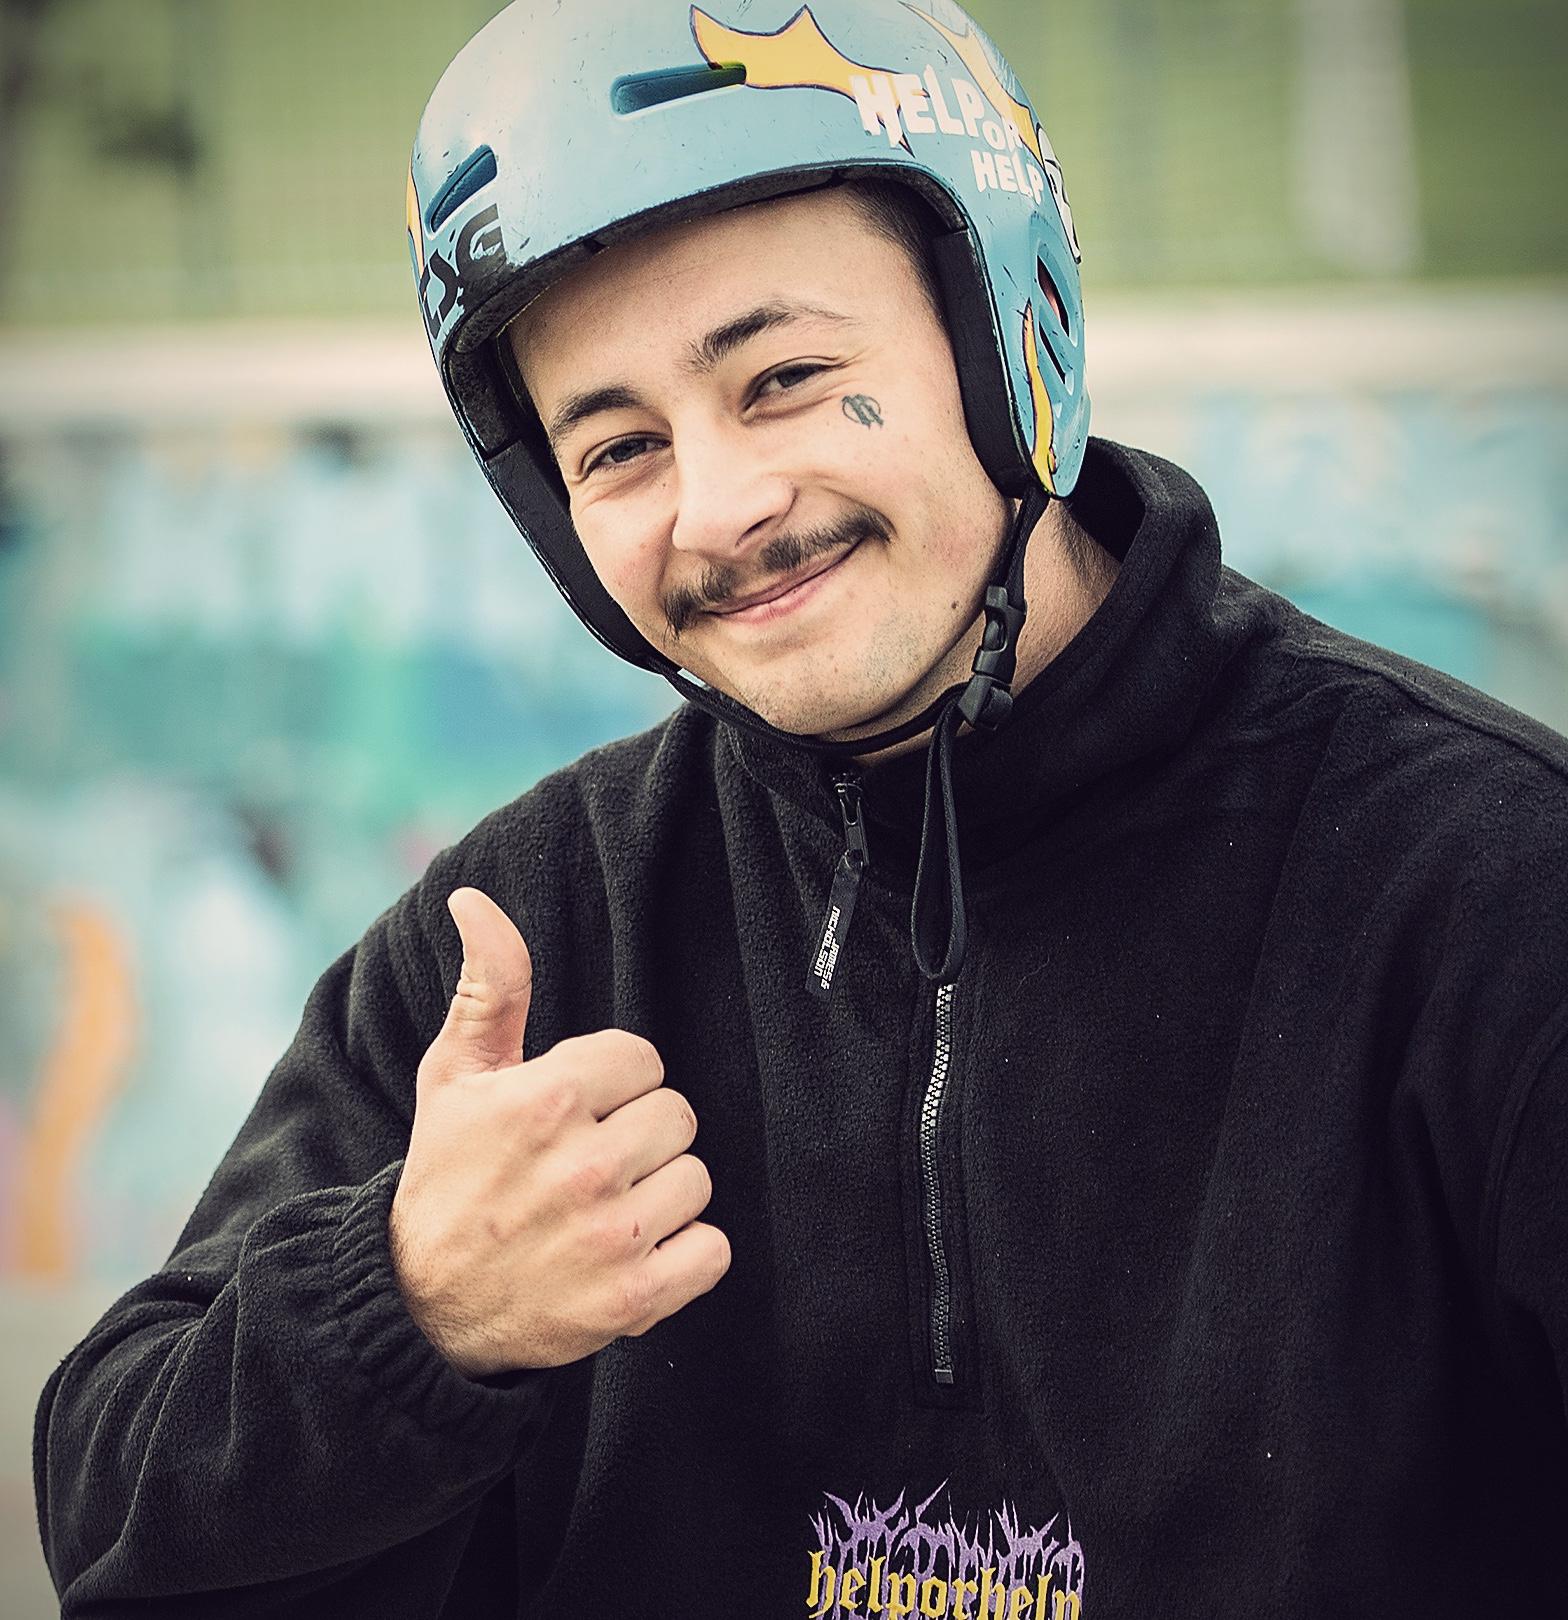 Alessio Tonoli TSG BMX rider